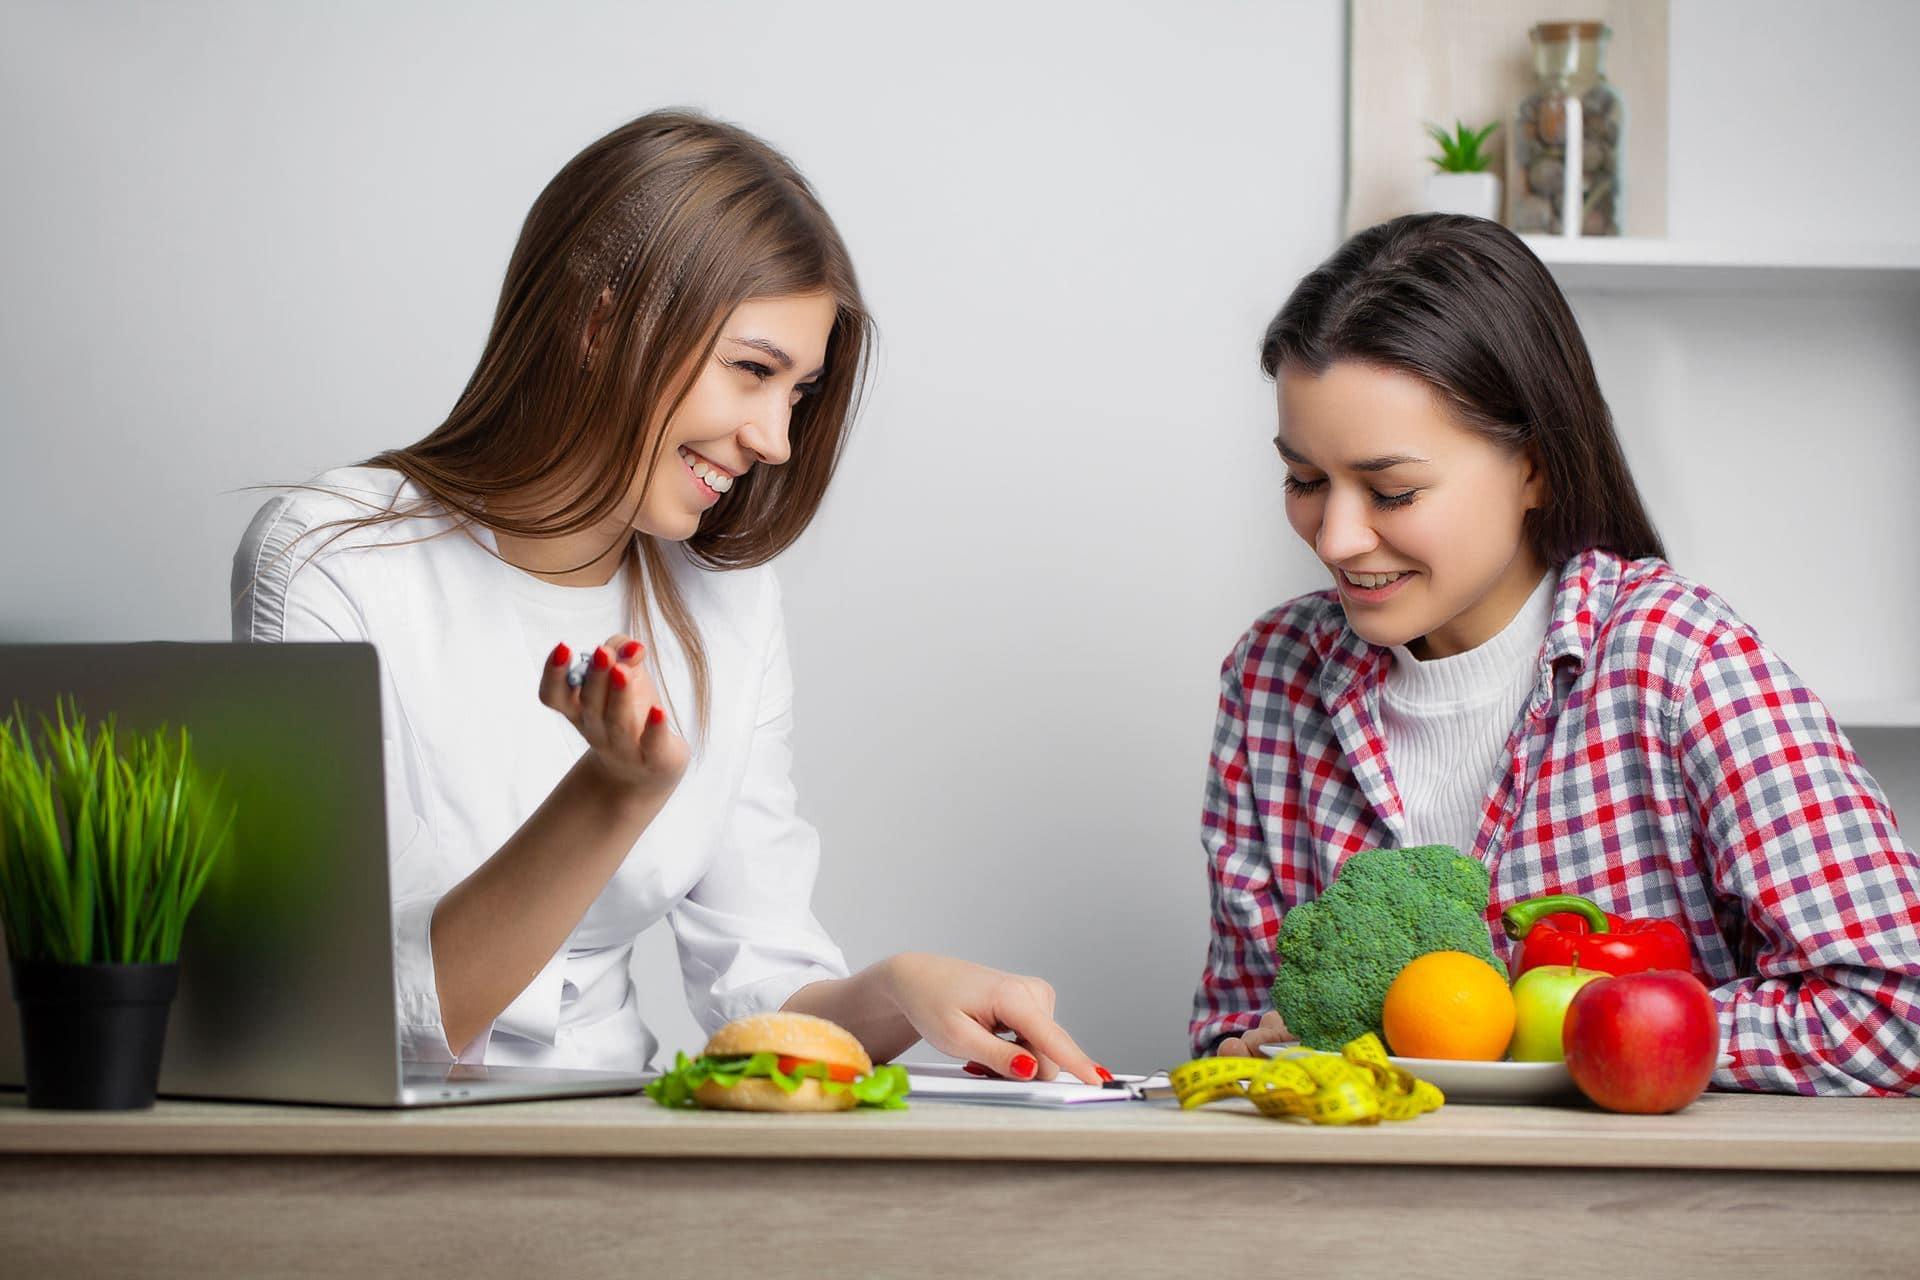 דיאטנית בנתניה - Restart Therapy דיאטנית קלינית